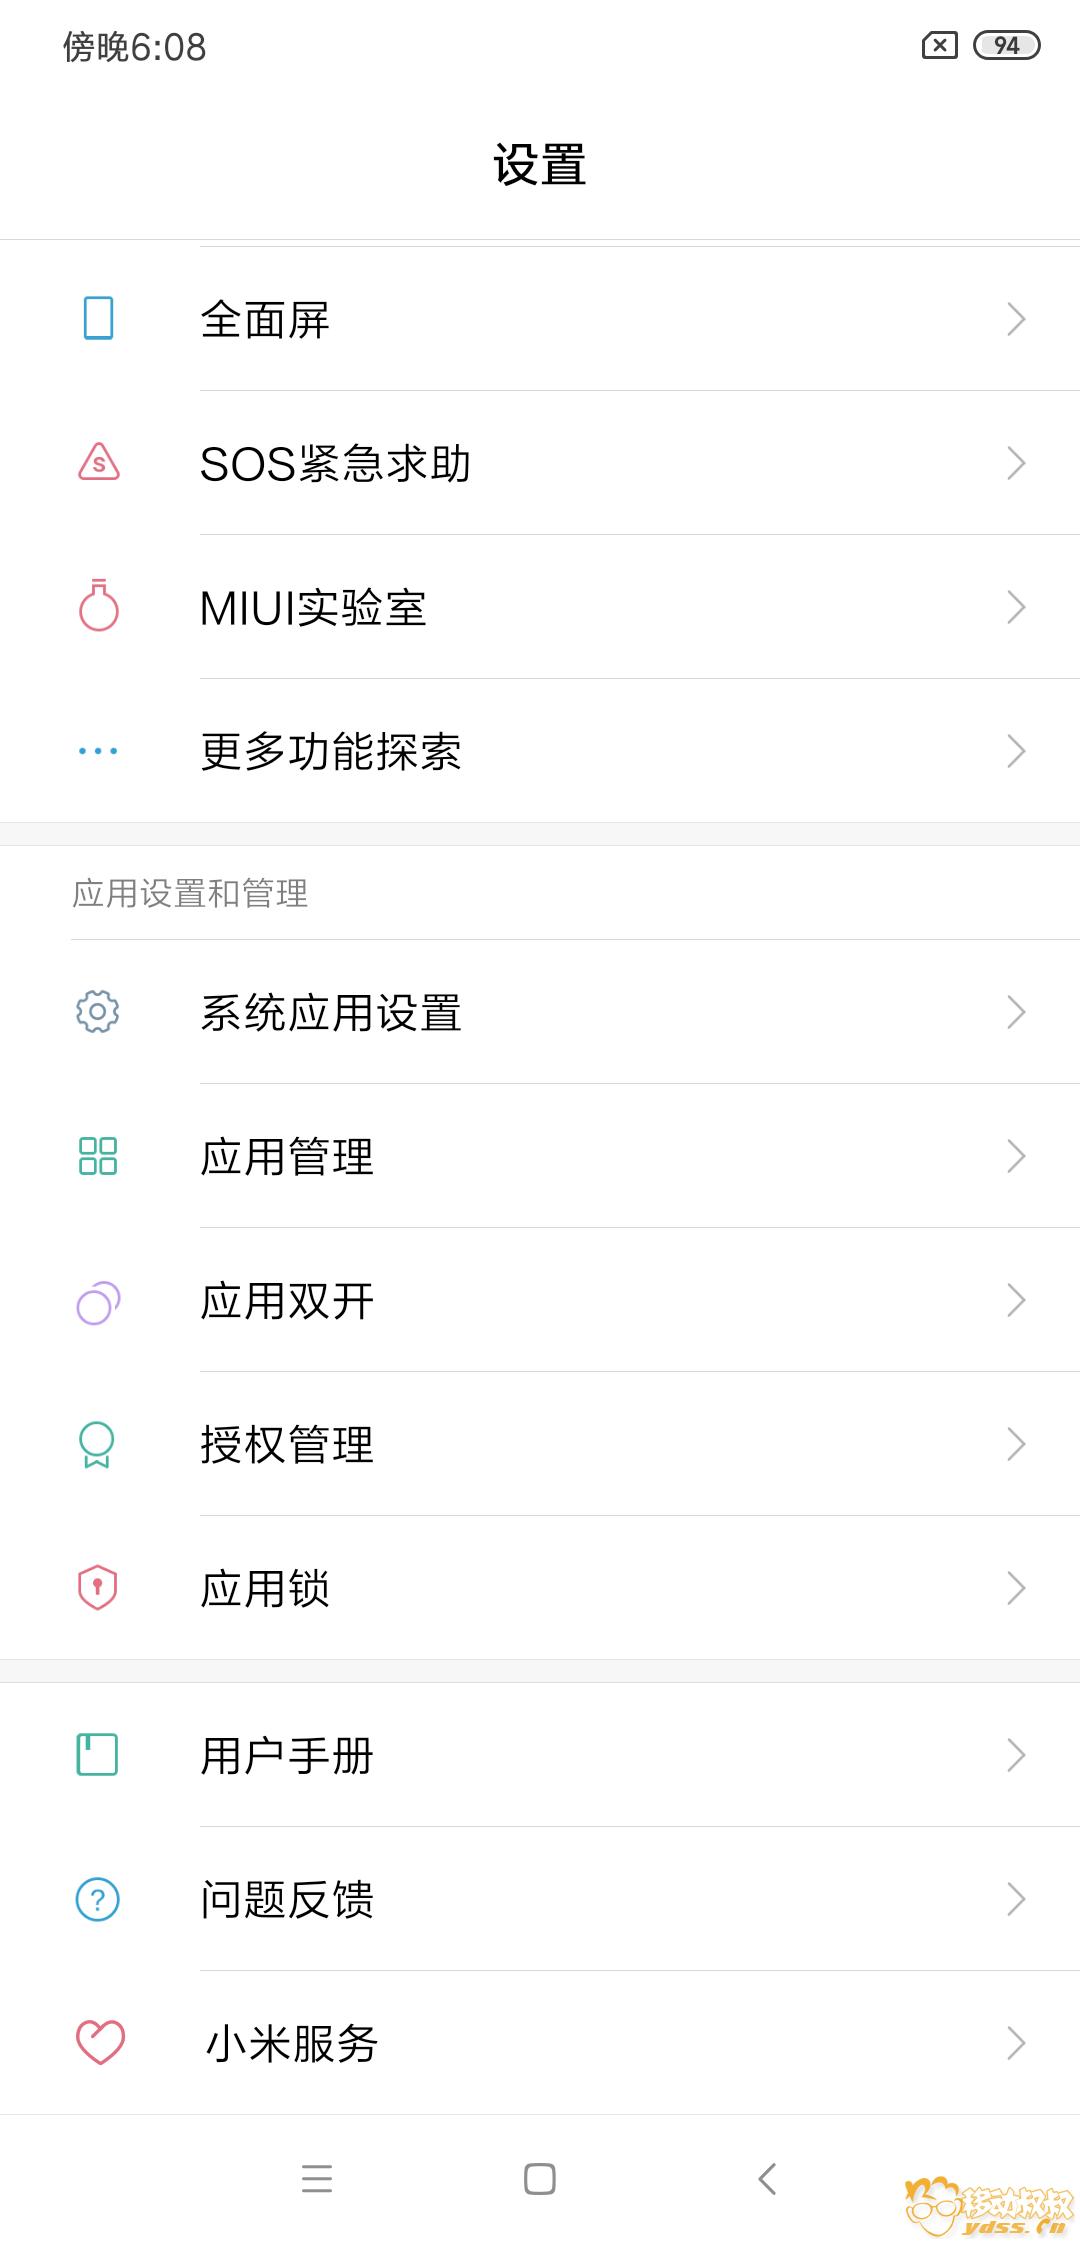 Screenshot_2019-04-12-18-08-21-735_com.android.settings.png